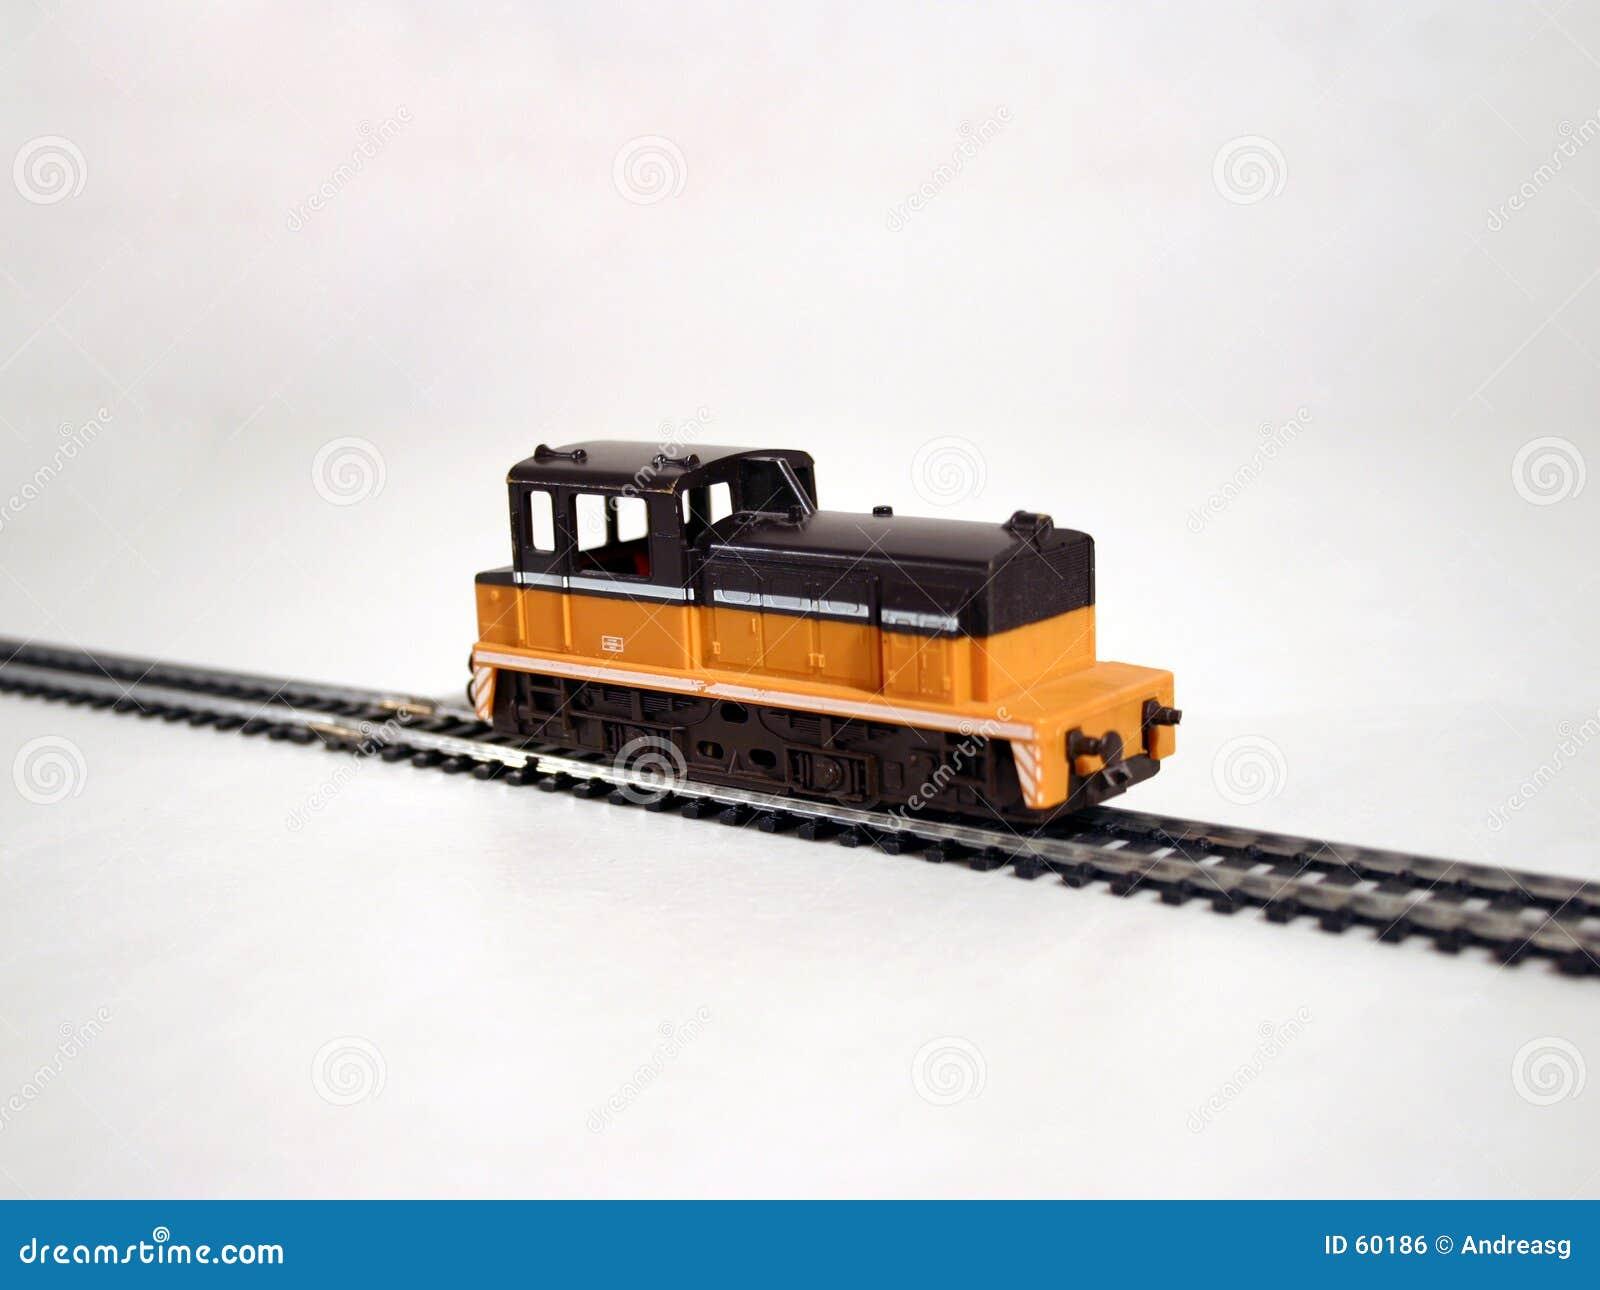 Download ατμομηχανή diesel 2 στοκ εικόνες. εικόνα από σταθμός, σιδηρόδρομος - 60186